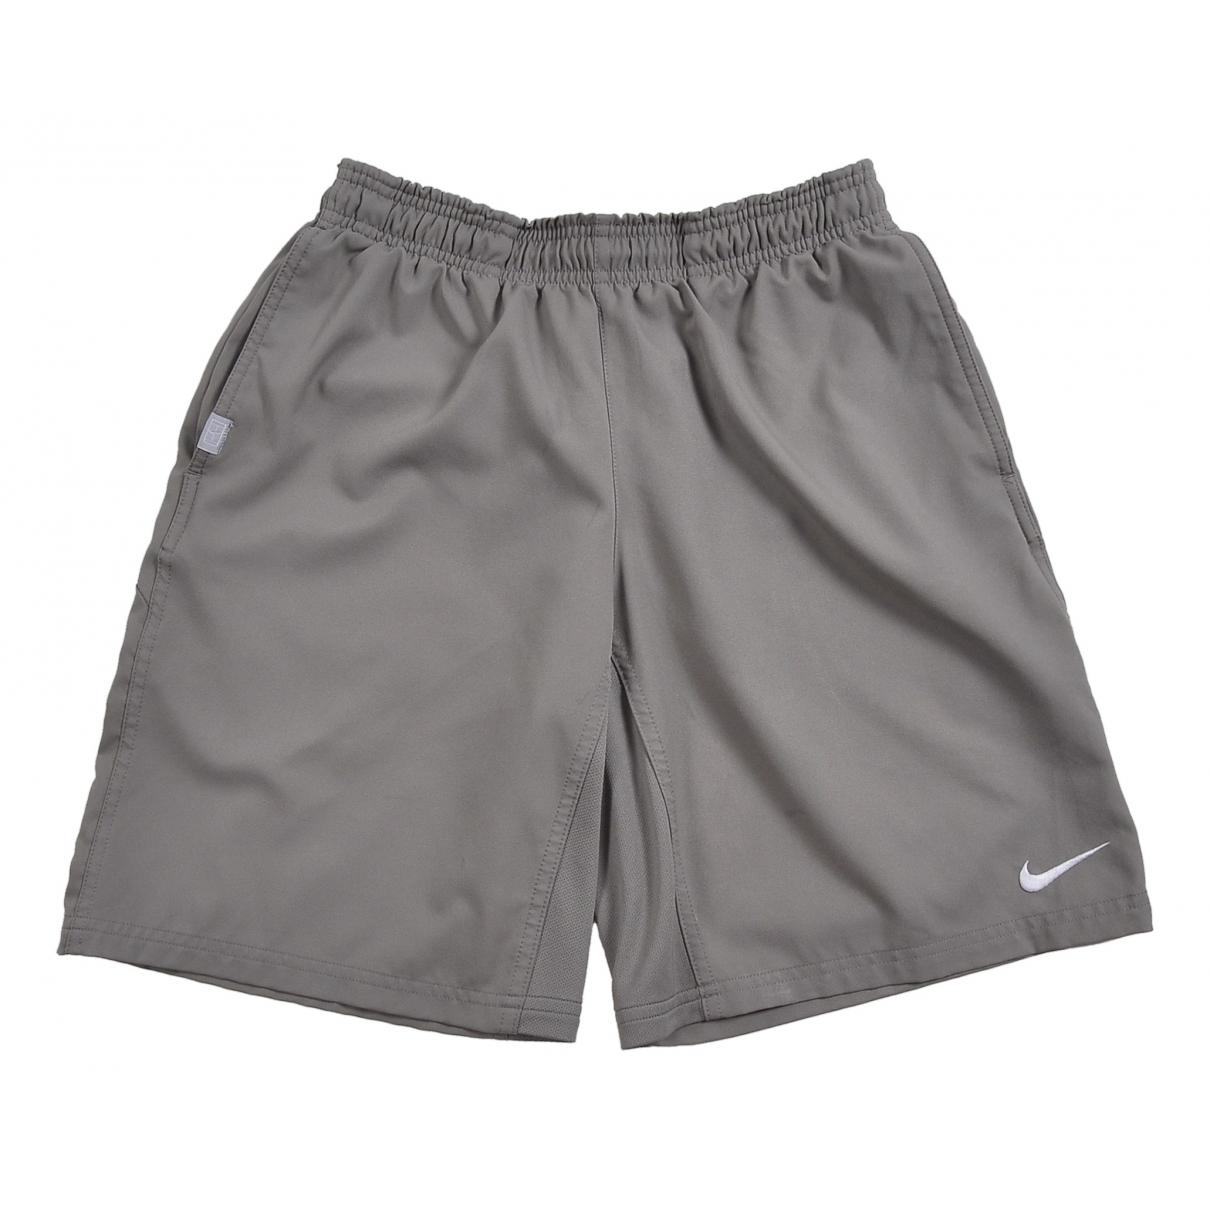 Nike \N Shorts in  Grau Polyester